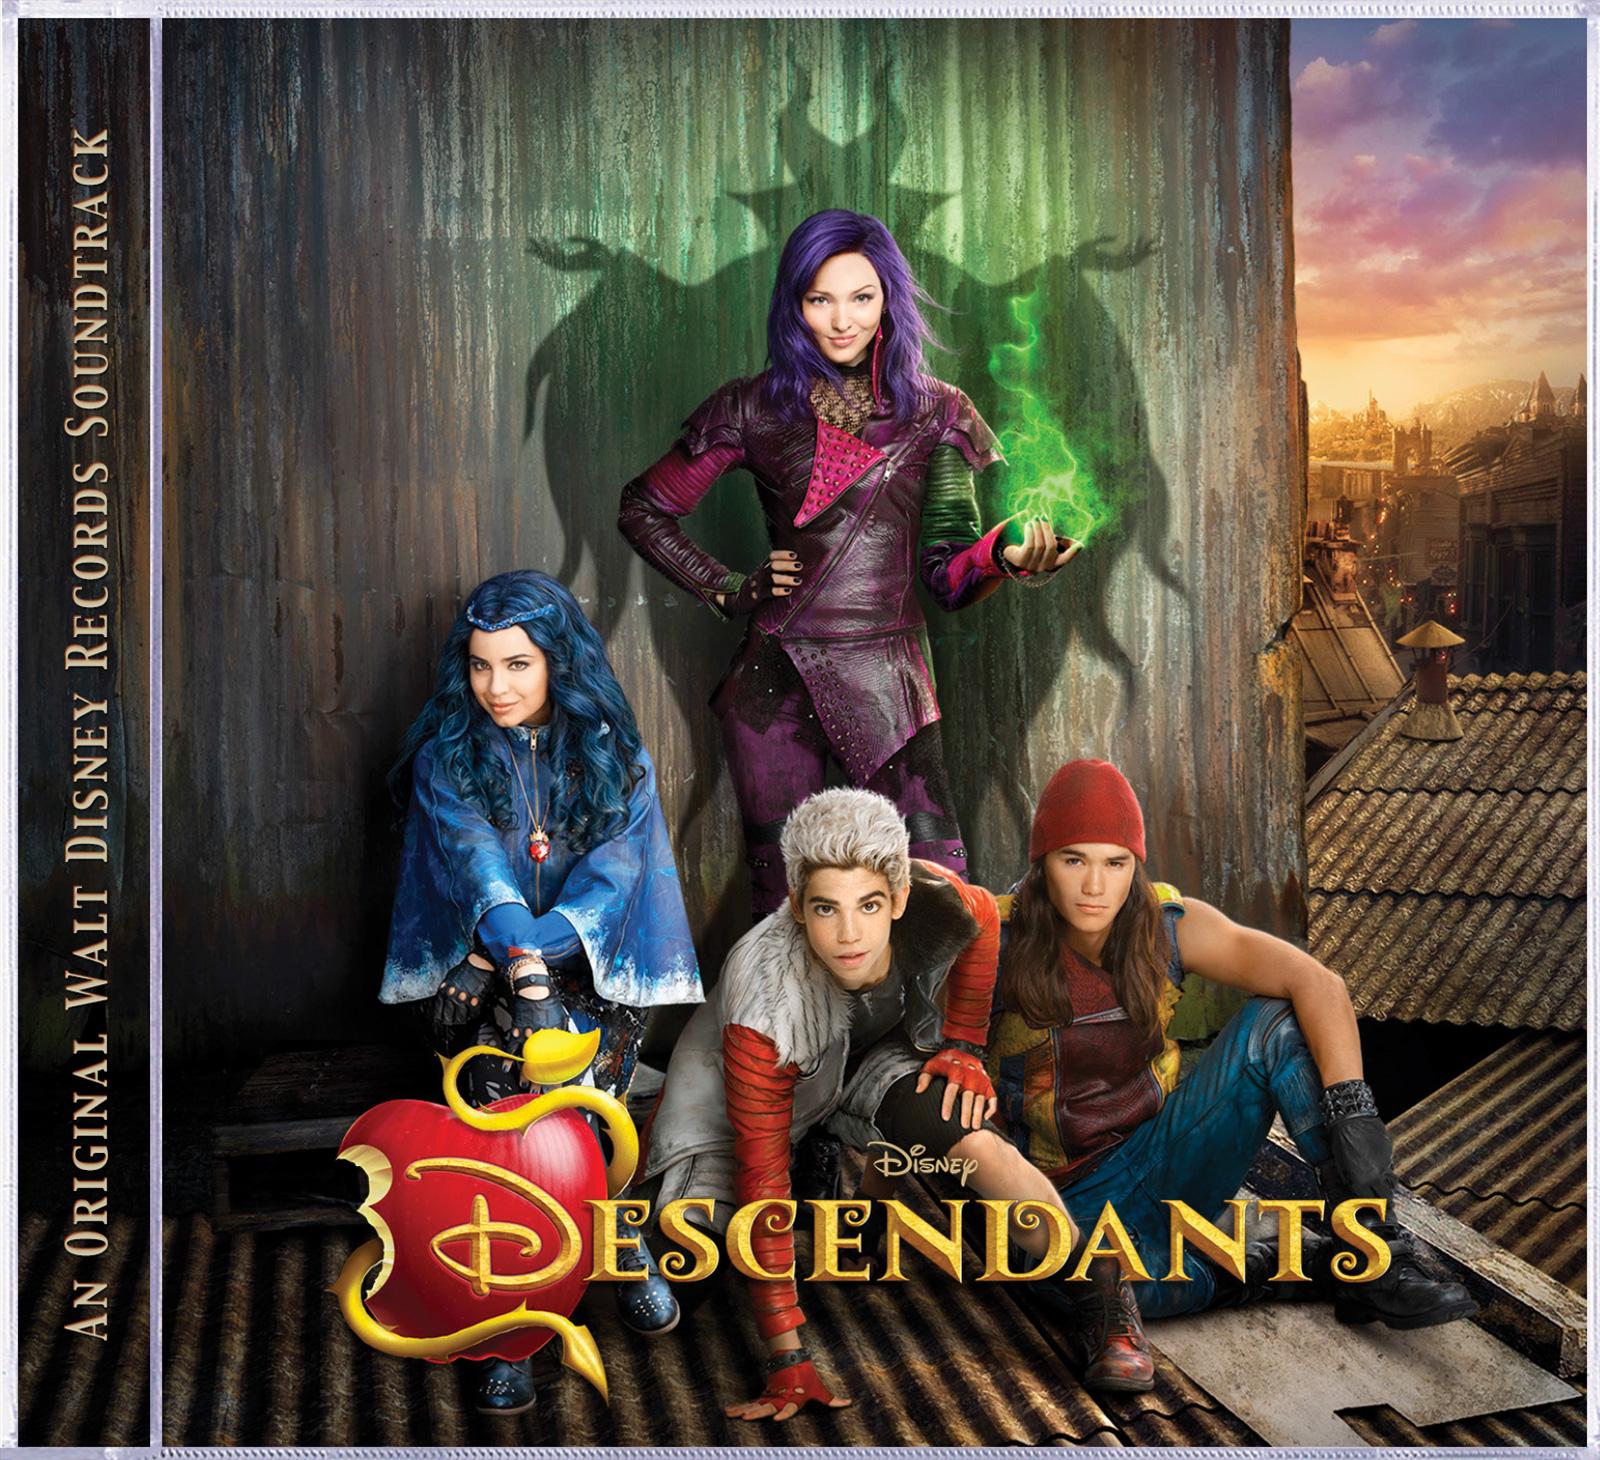 Disney dvd movie permission